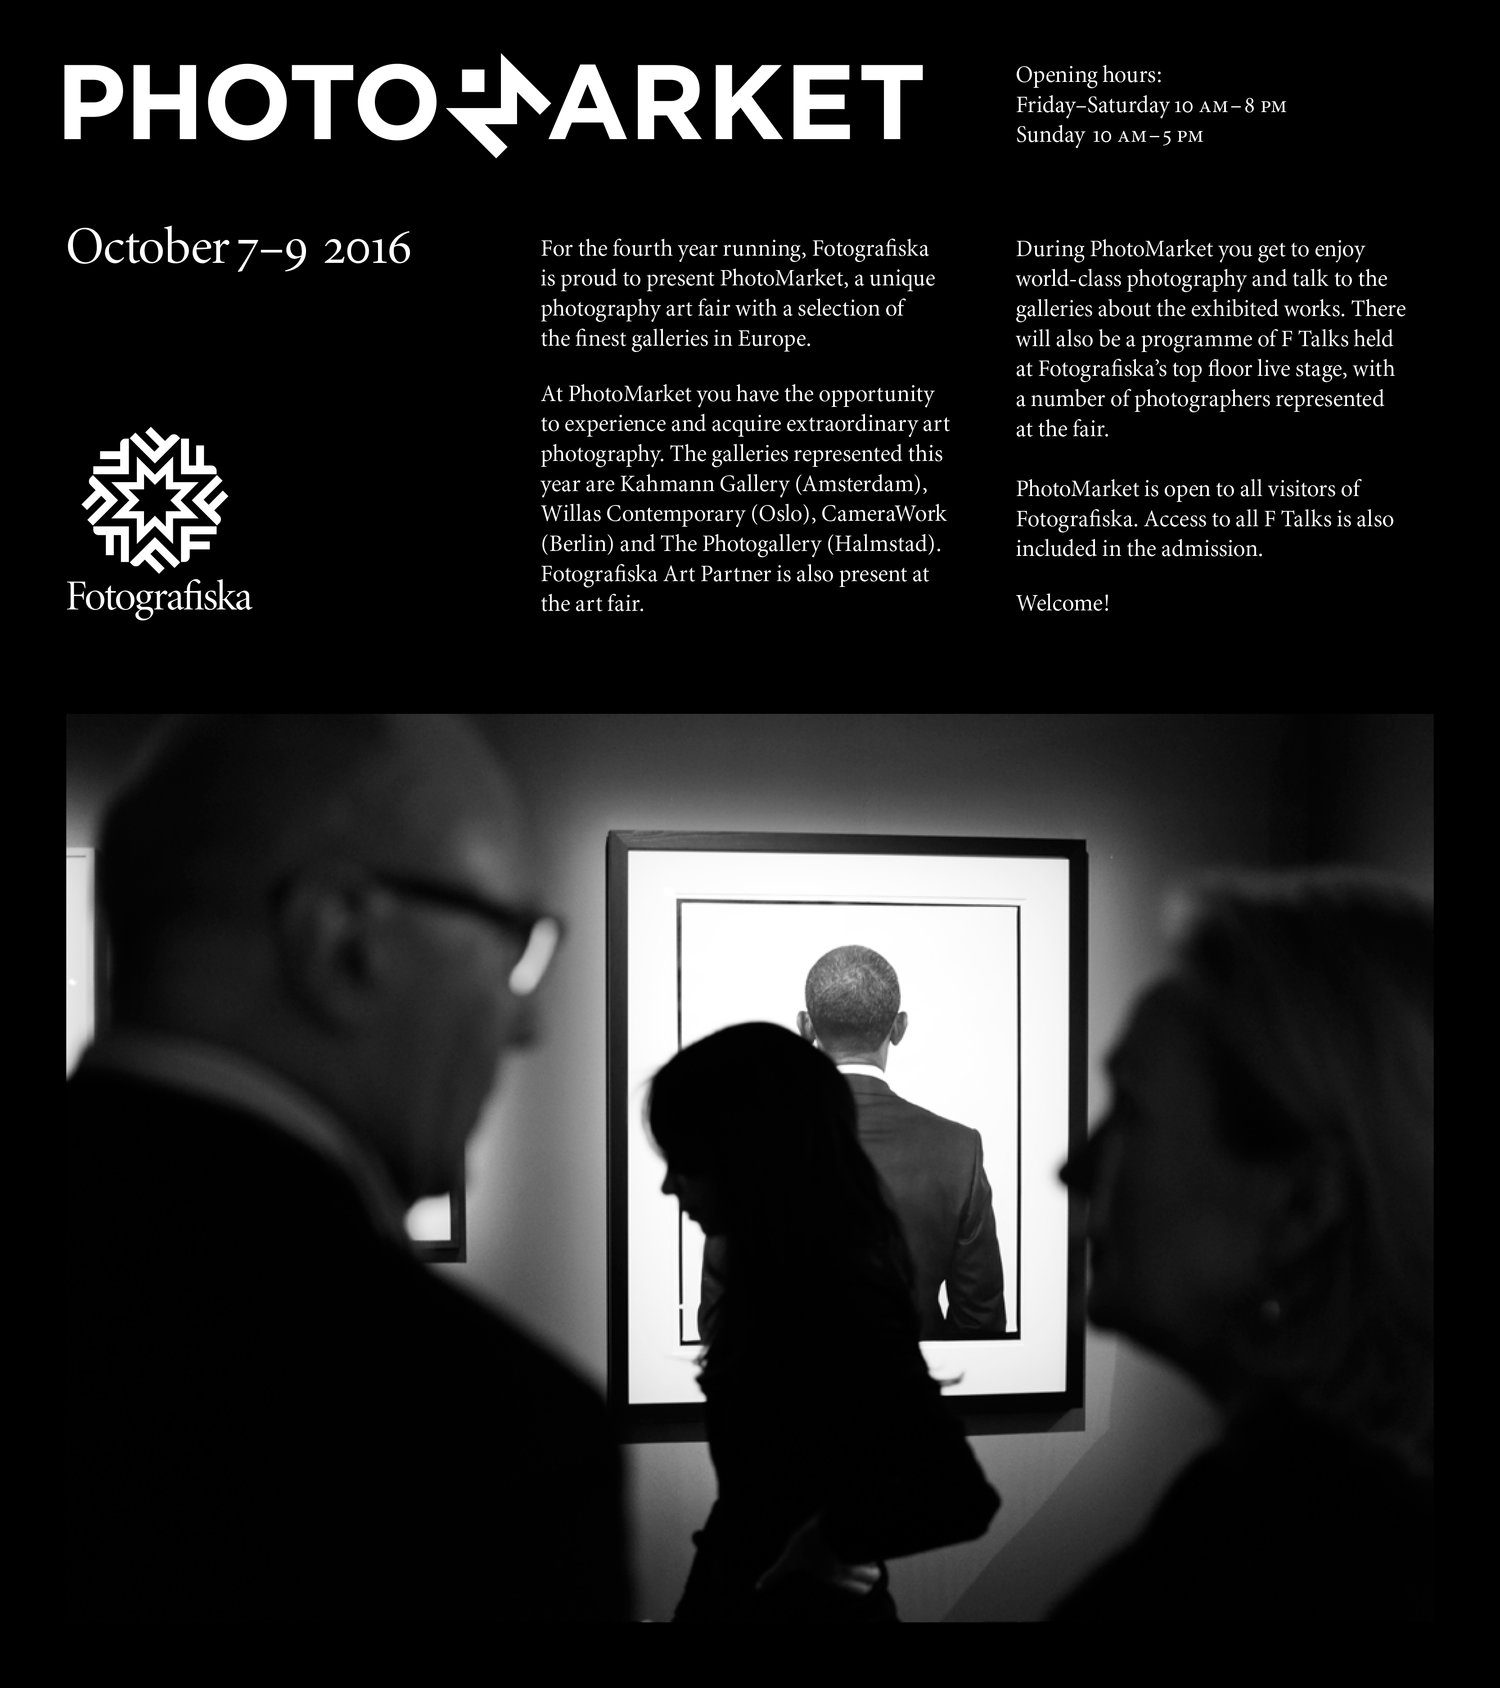 PhotoMarket at Fotografiska